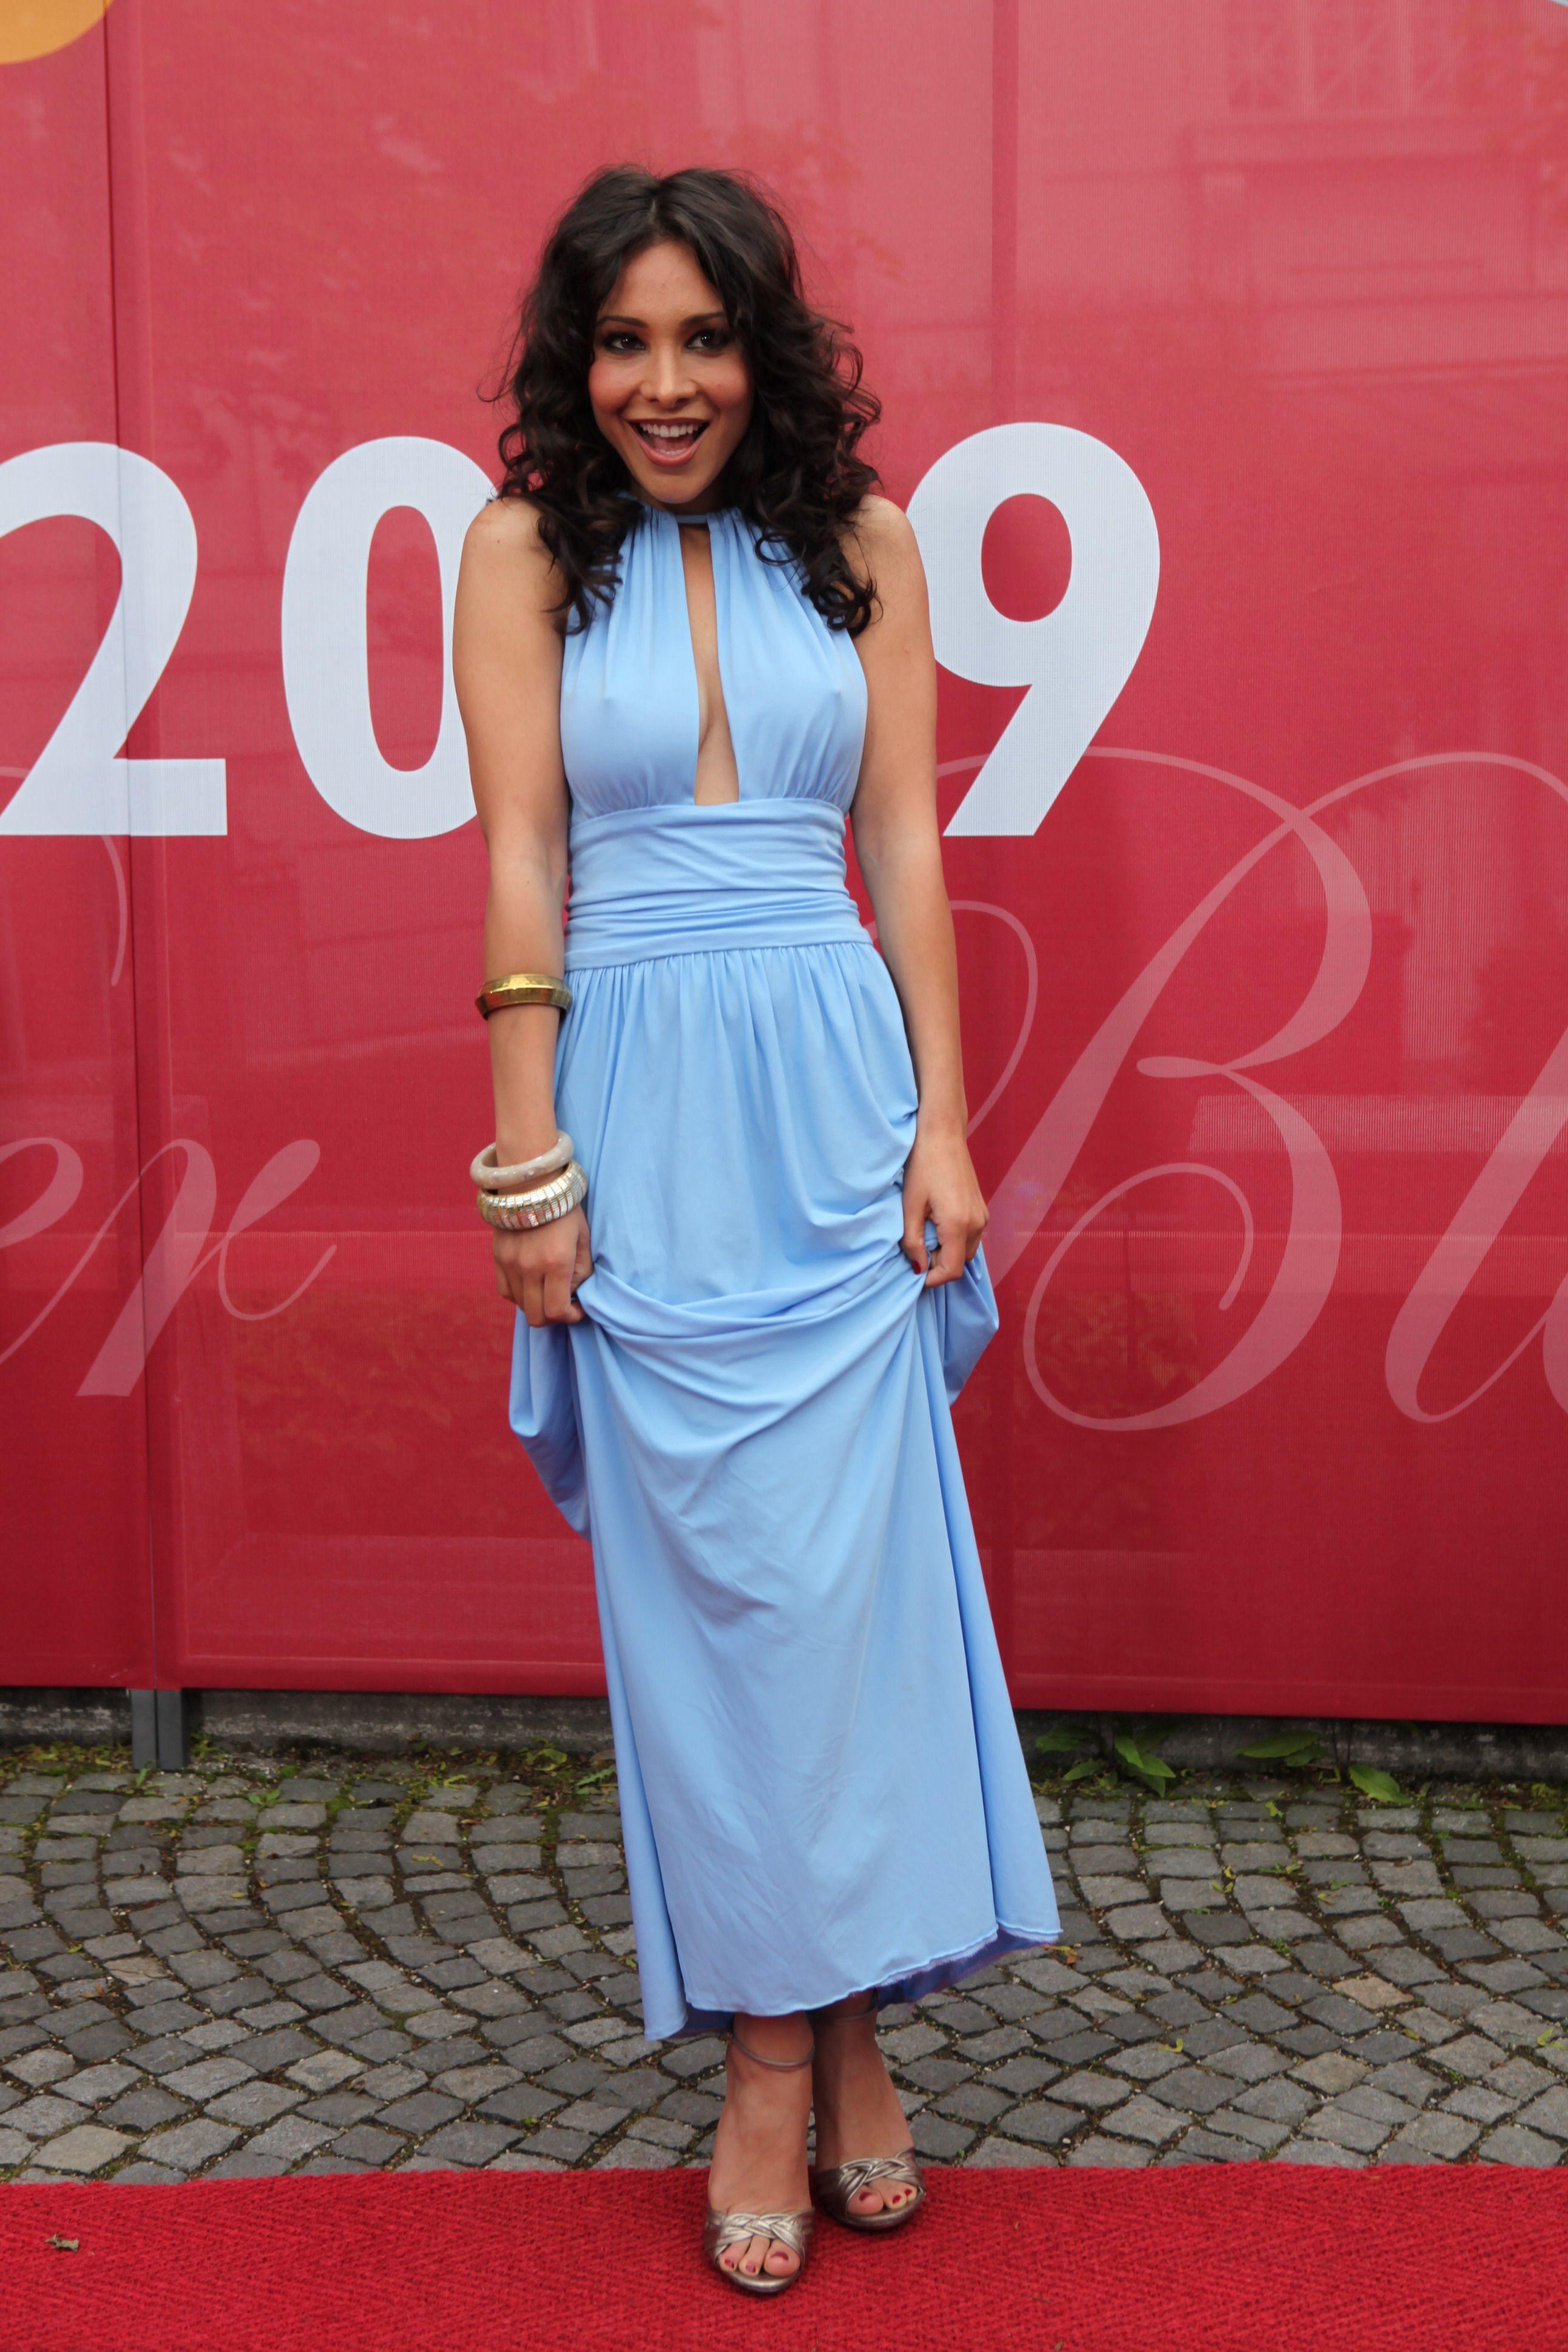 - Sandra-Ahrabian-Feet-652618